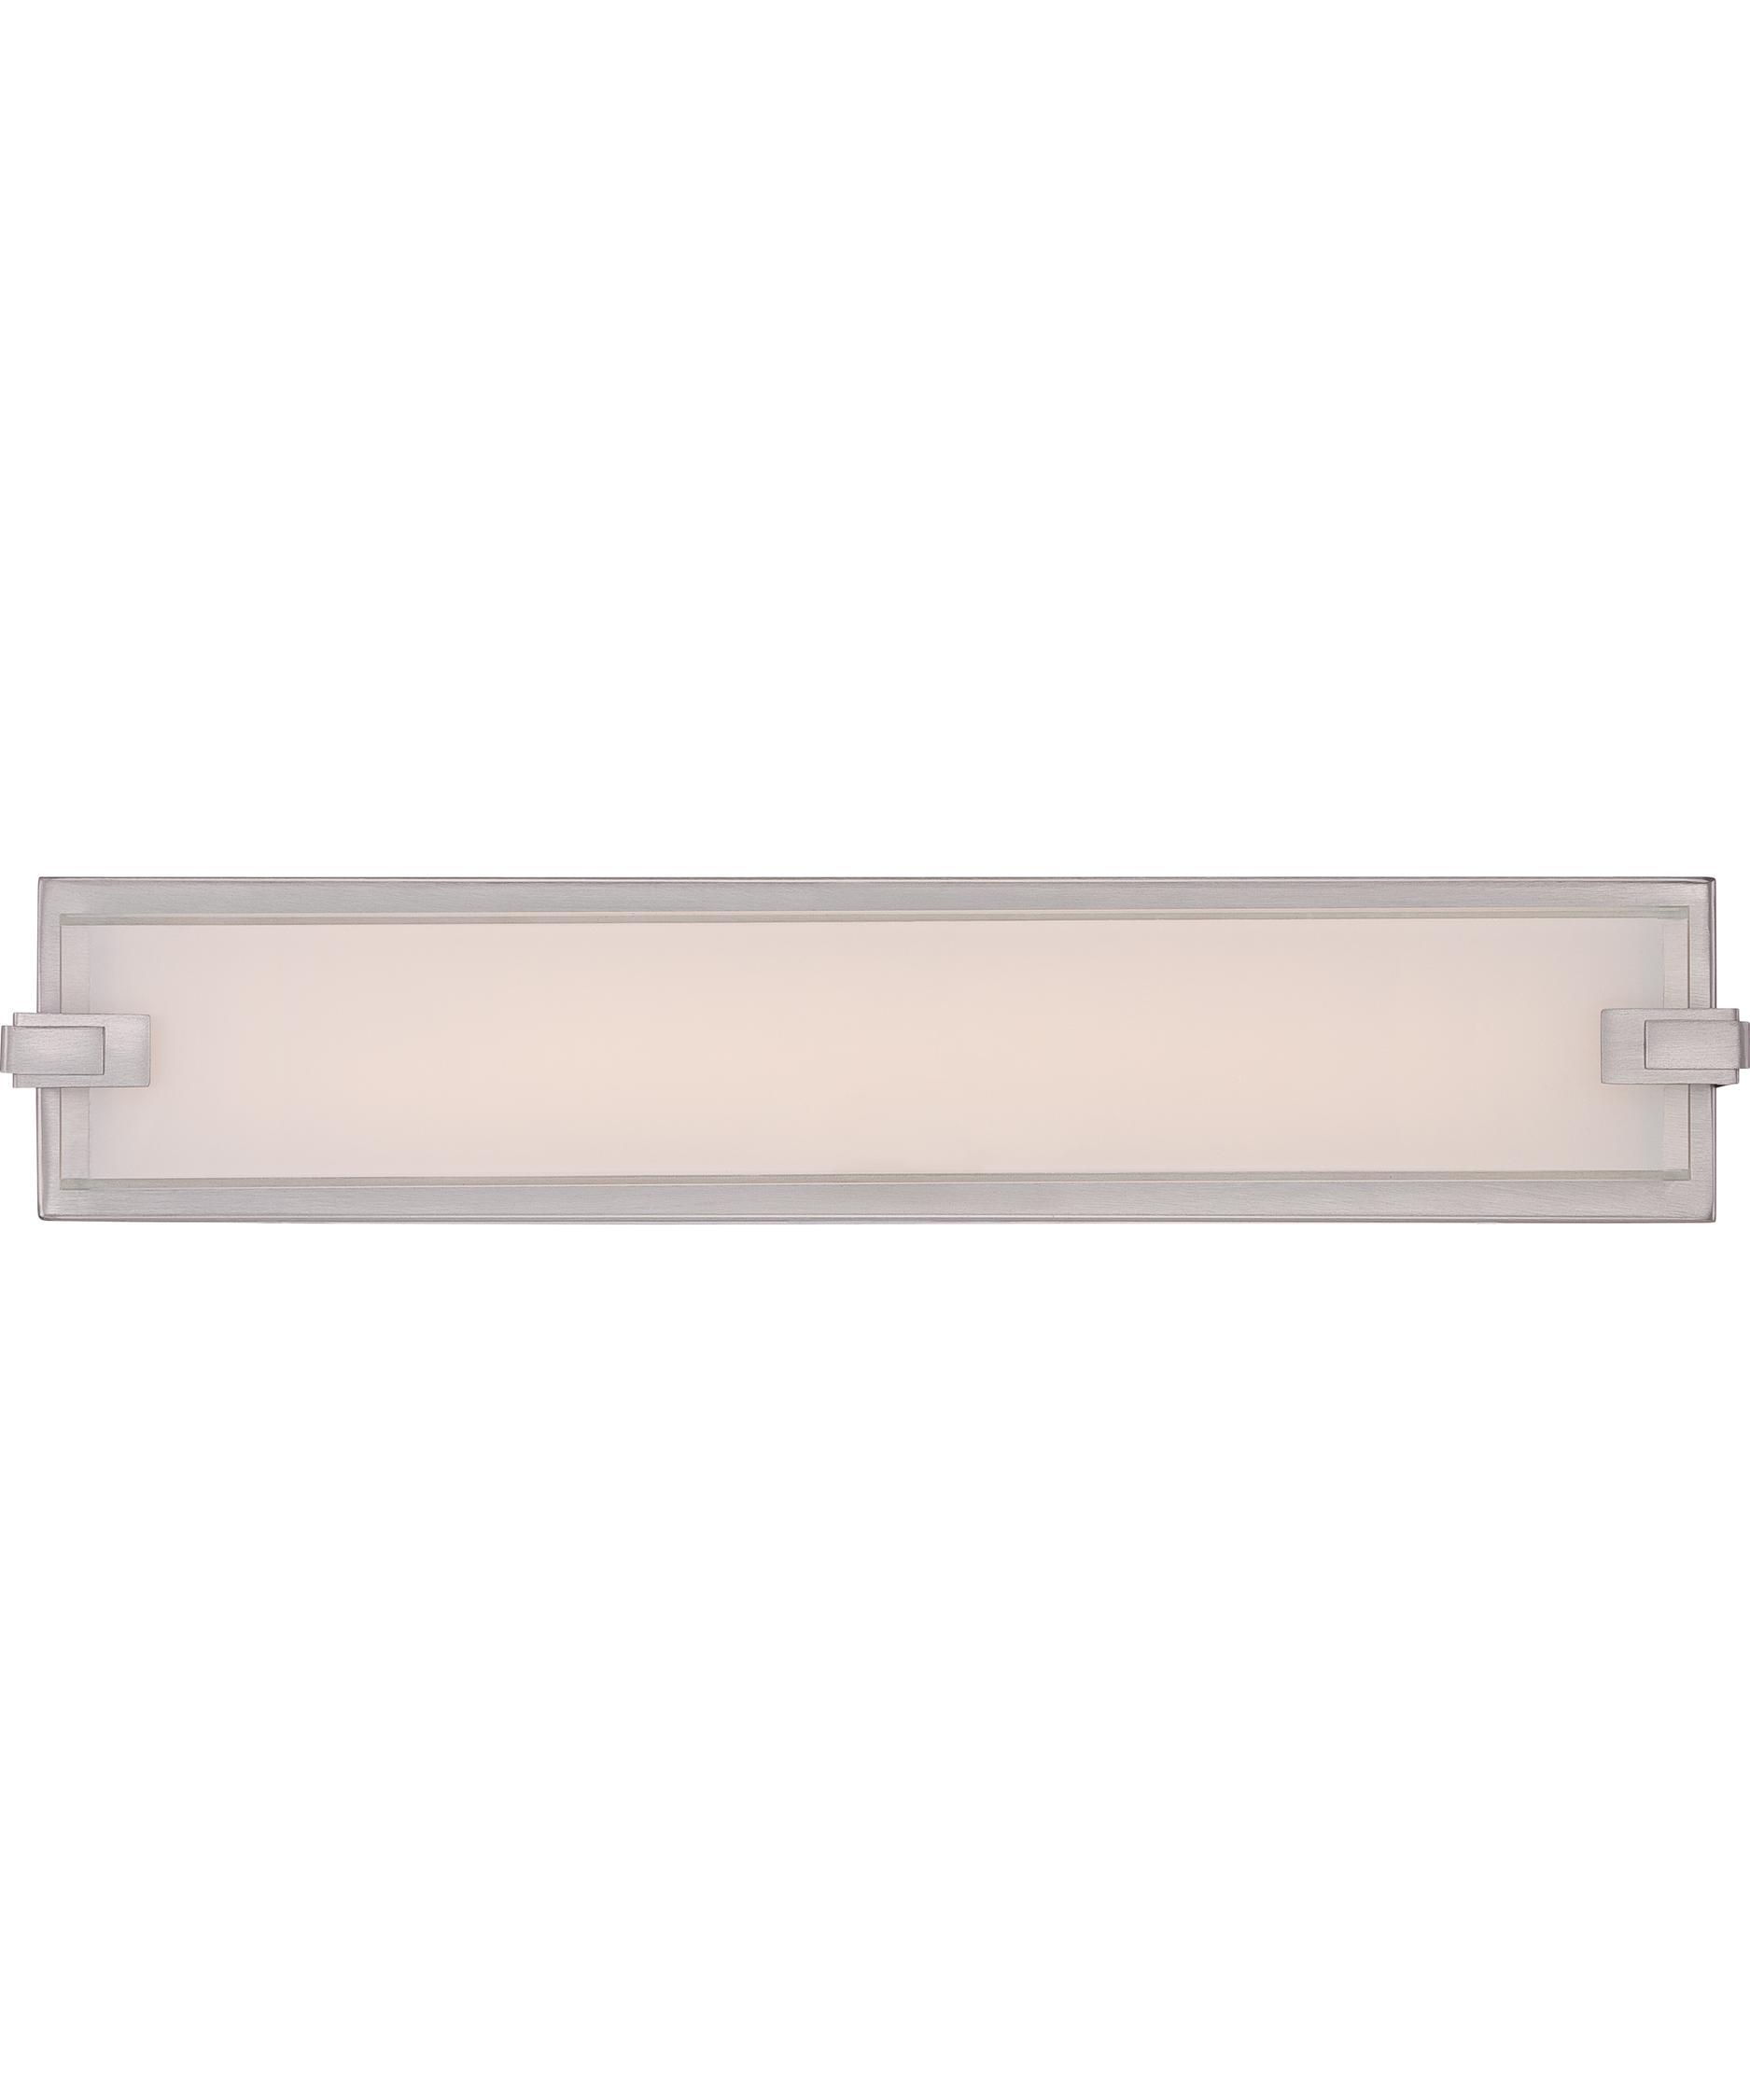 Bathroom Vanity Lights For Sale quoizel pcdh8522 platinum dash 22 inch wide bath vanity light